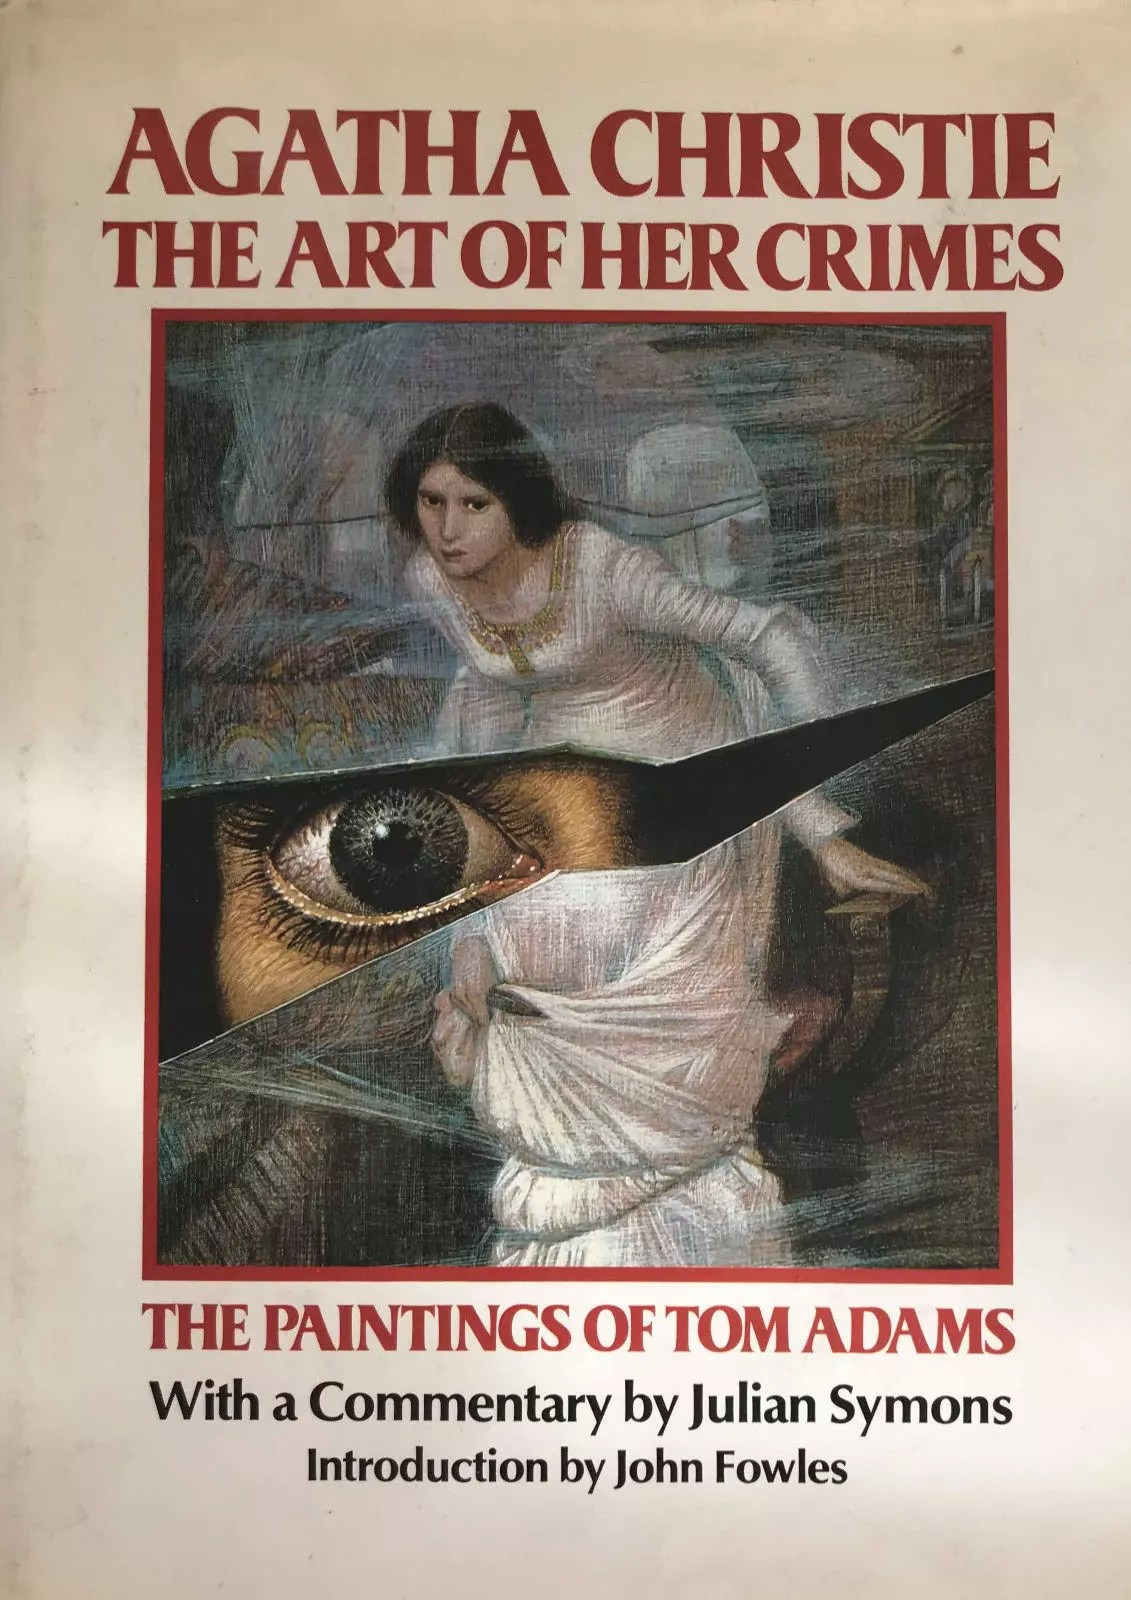 Tom Adams Agatha Christie Art of Her Crimes